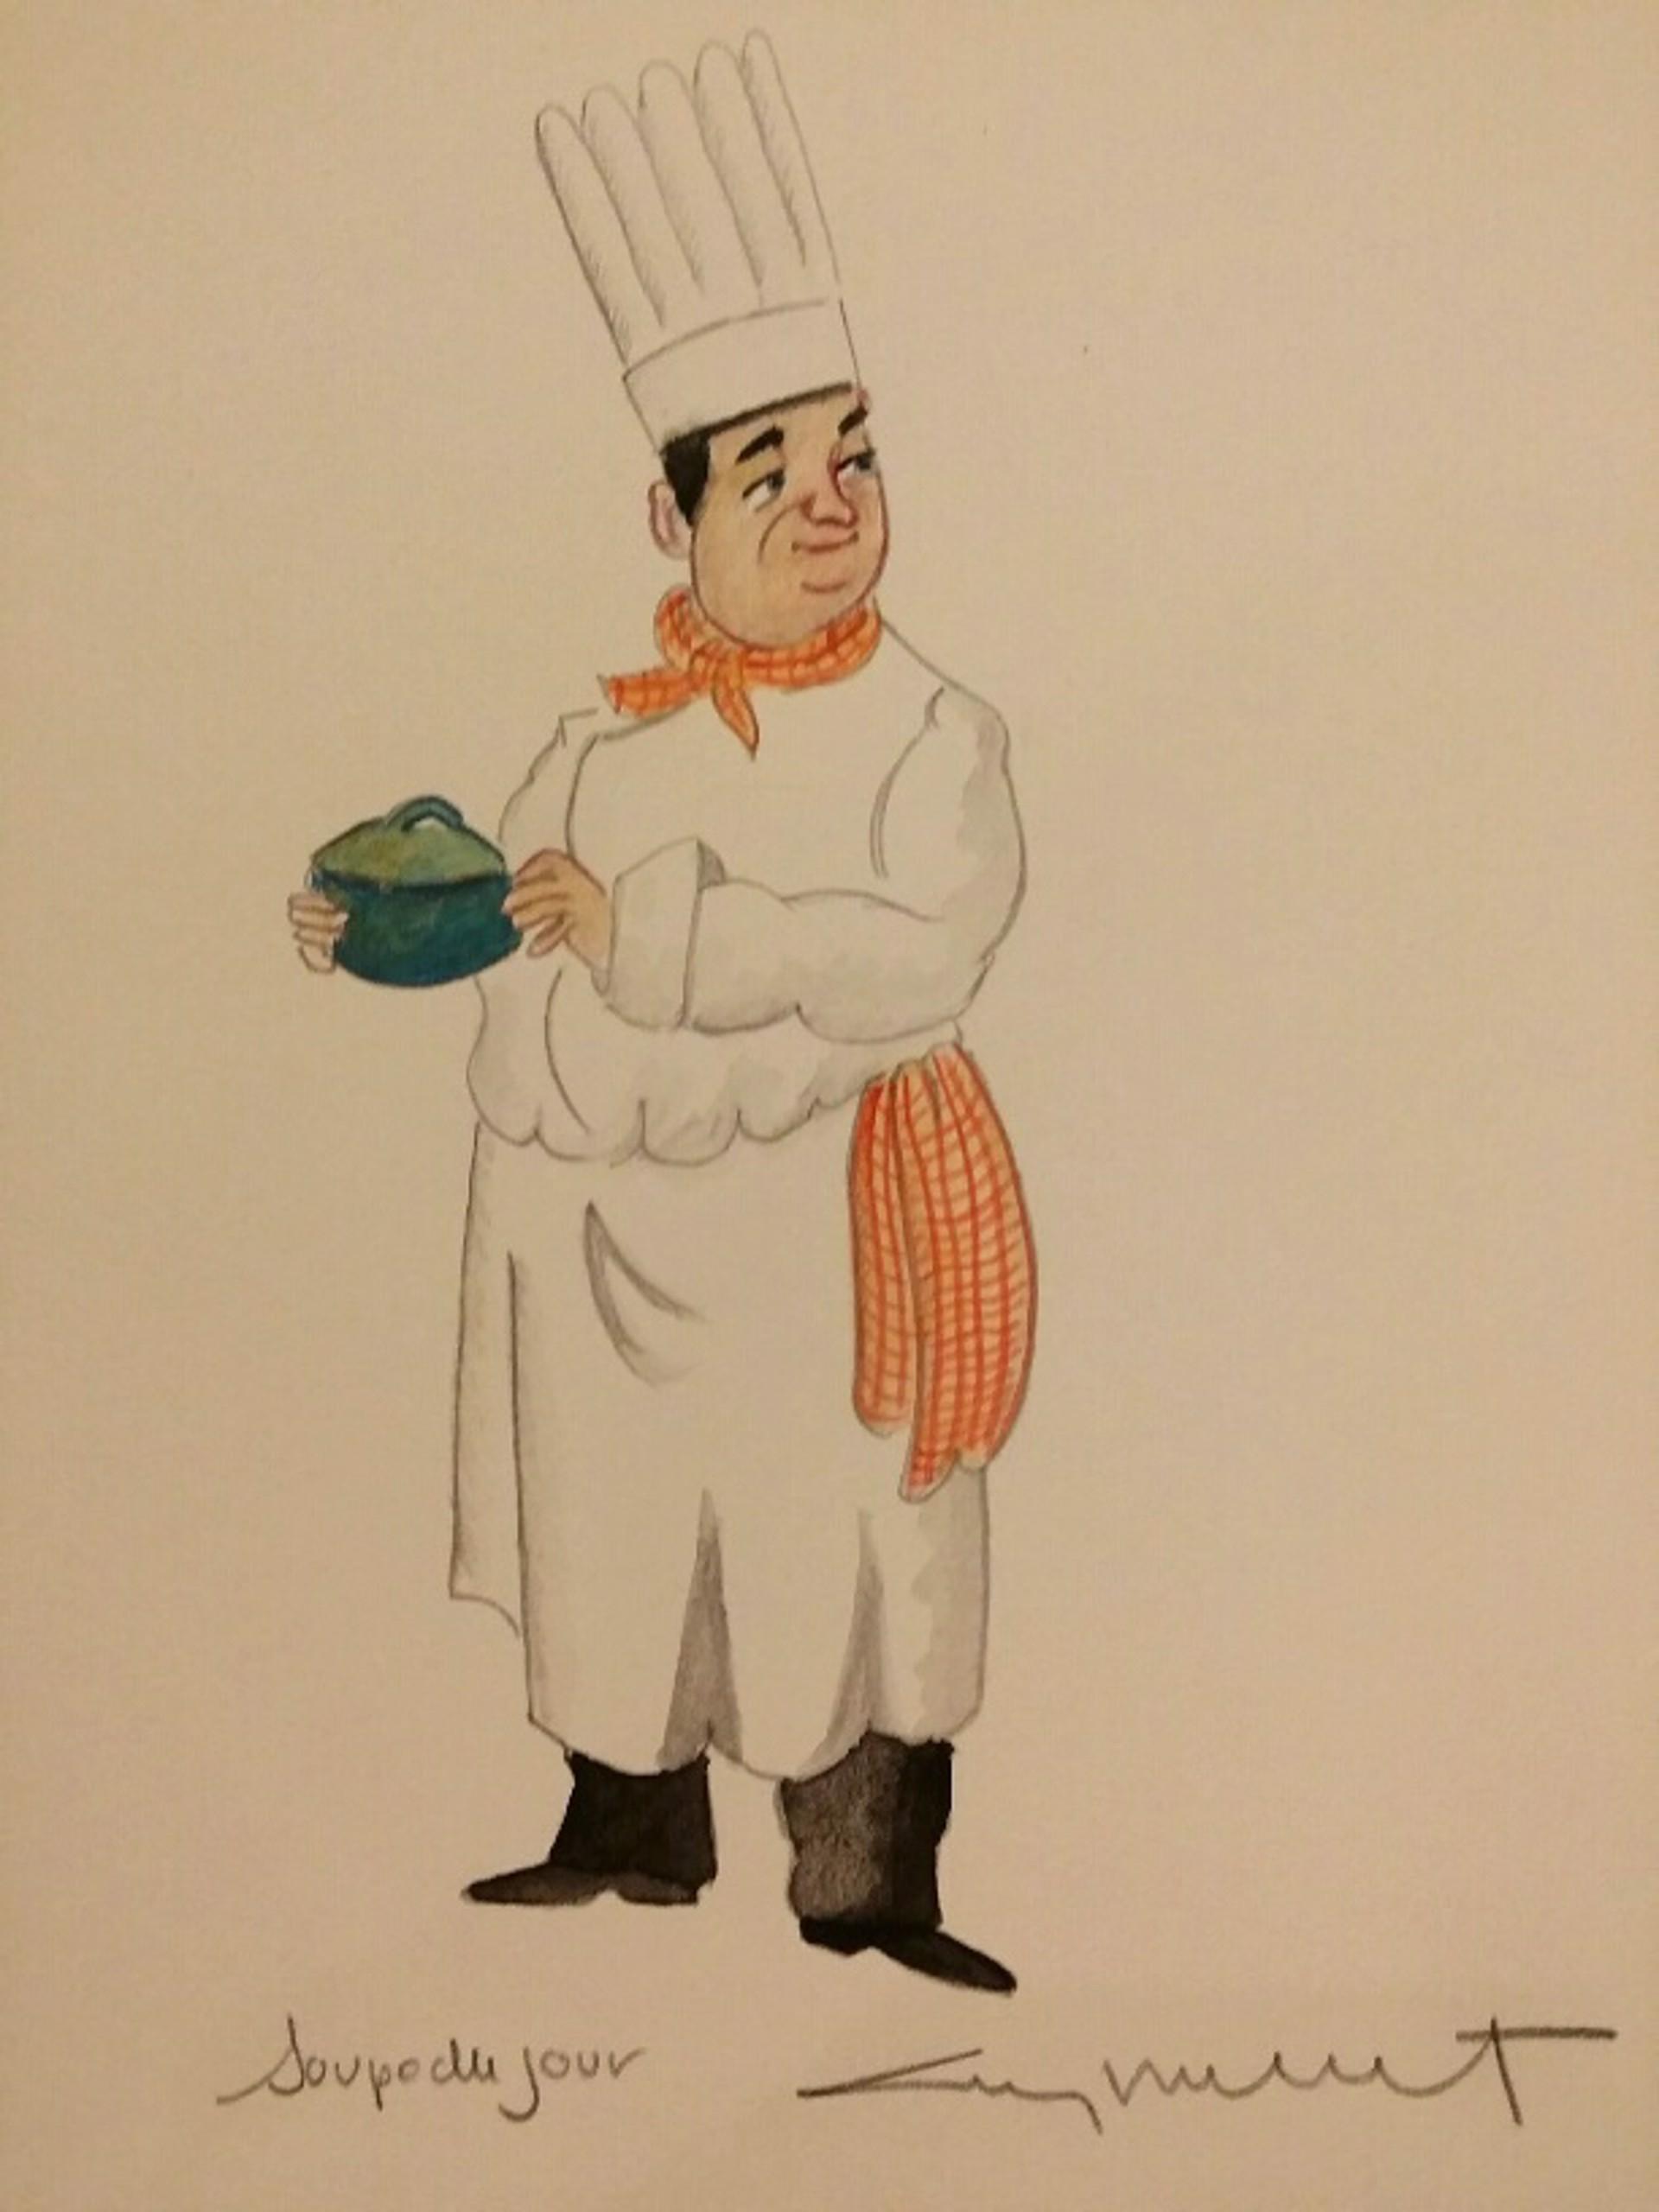 Soup Du Jour by Guy Buffet